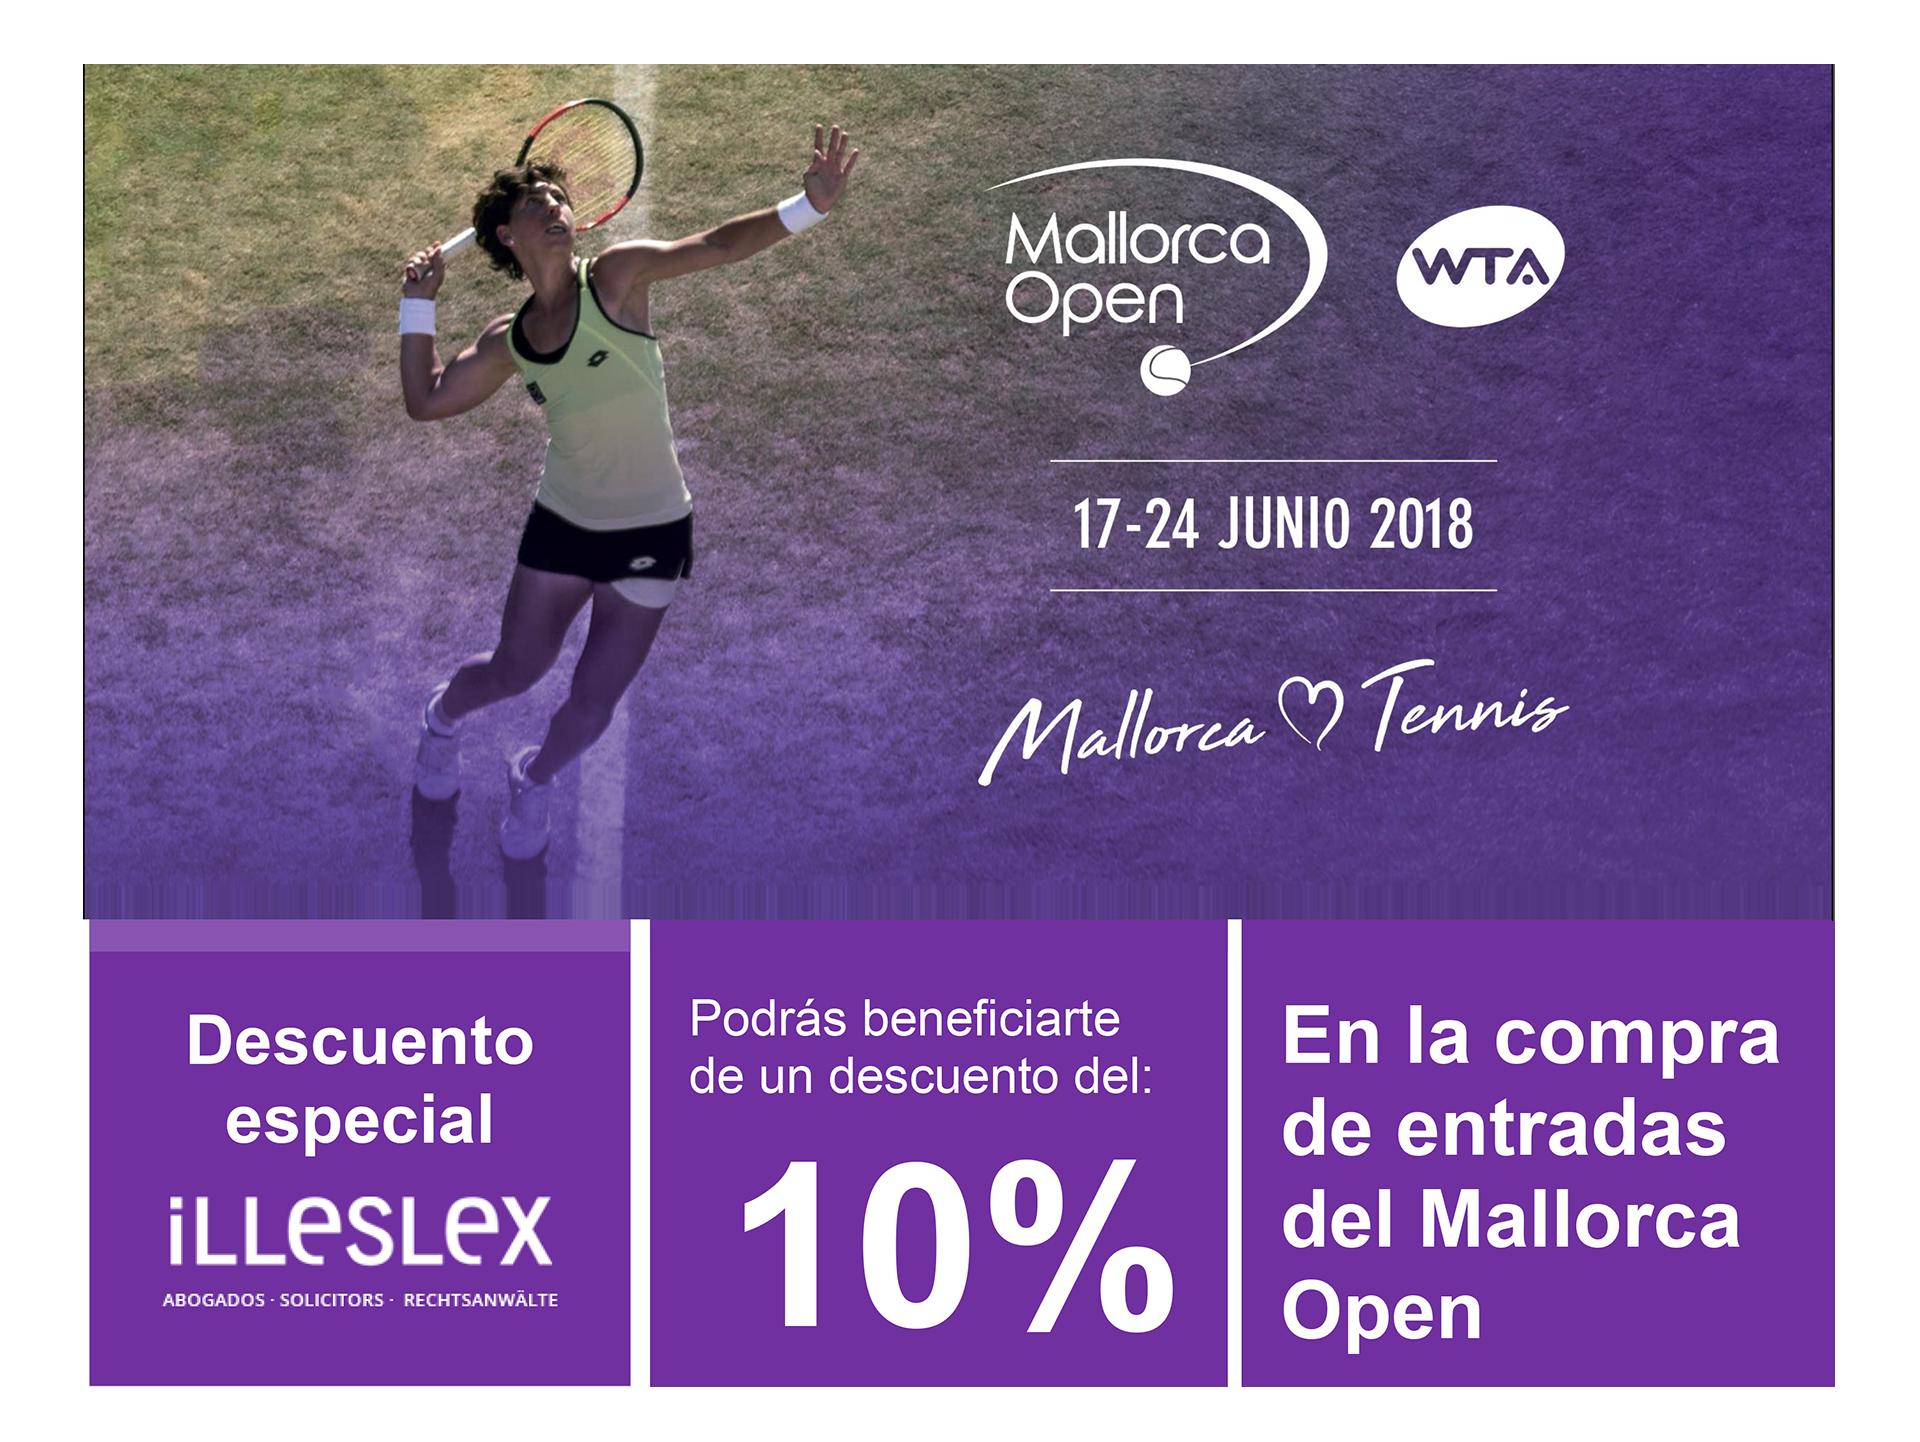 Illeslex, asesor legal del WTA Mallorca Open